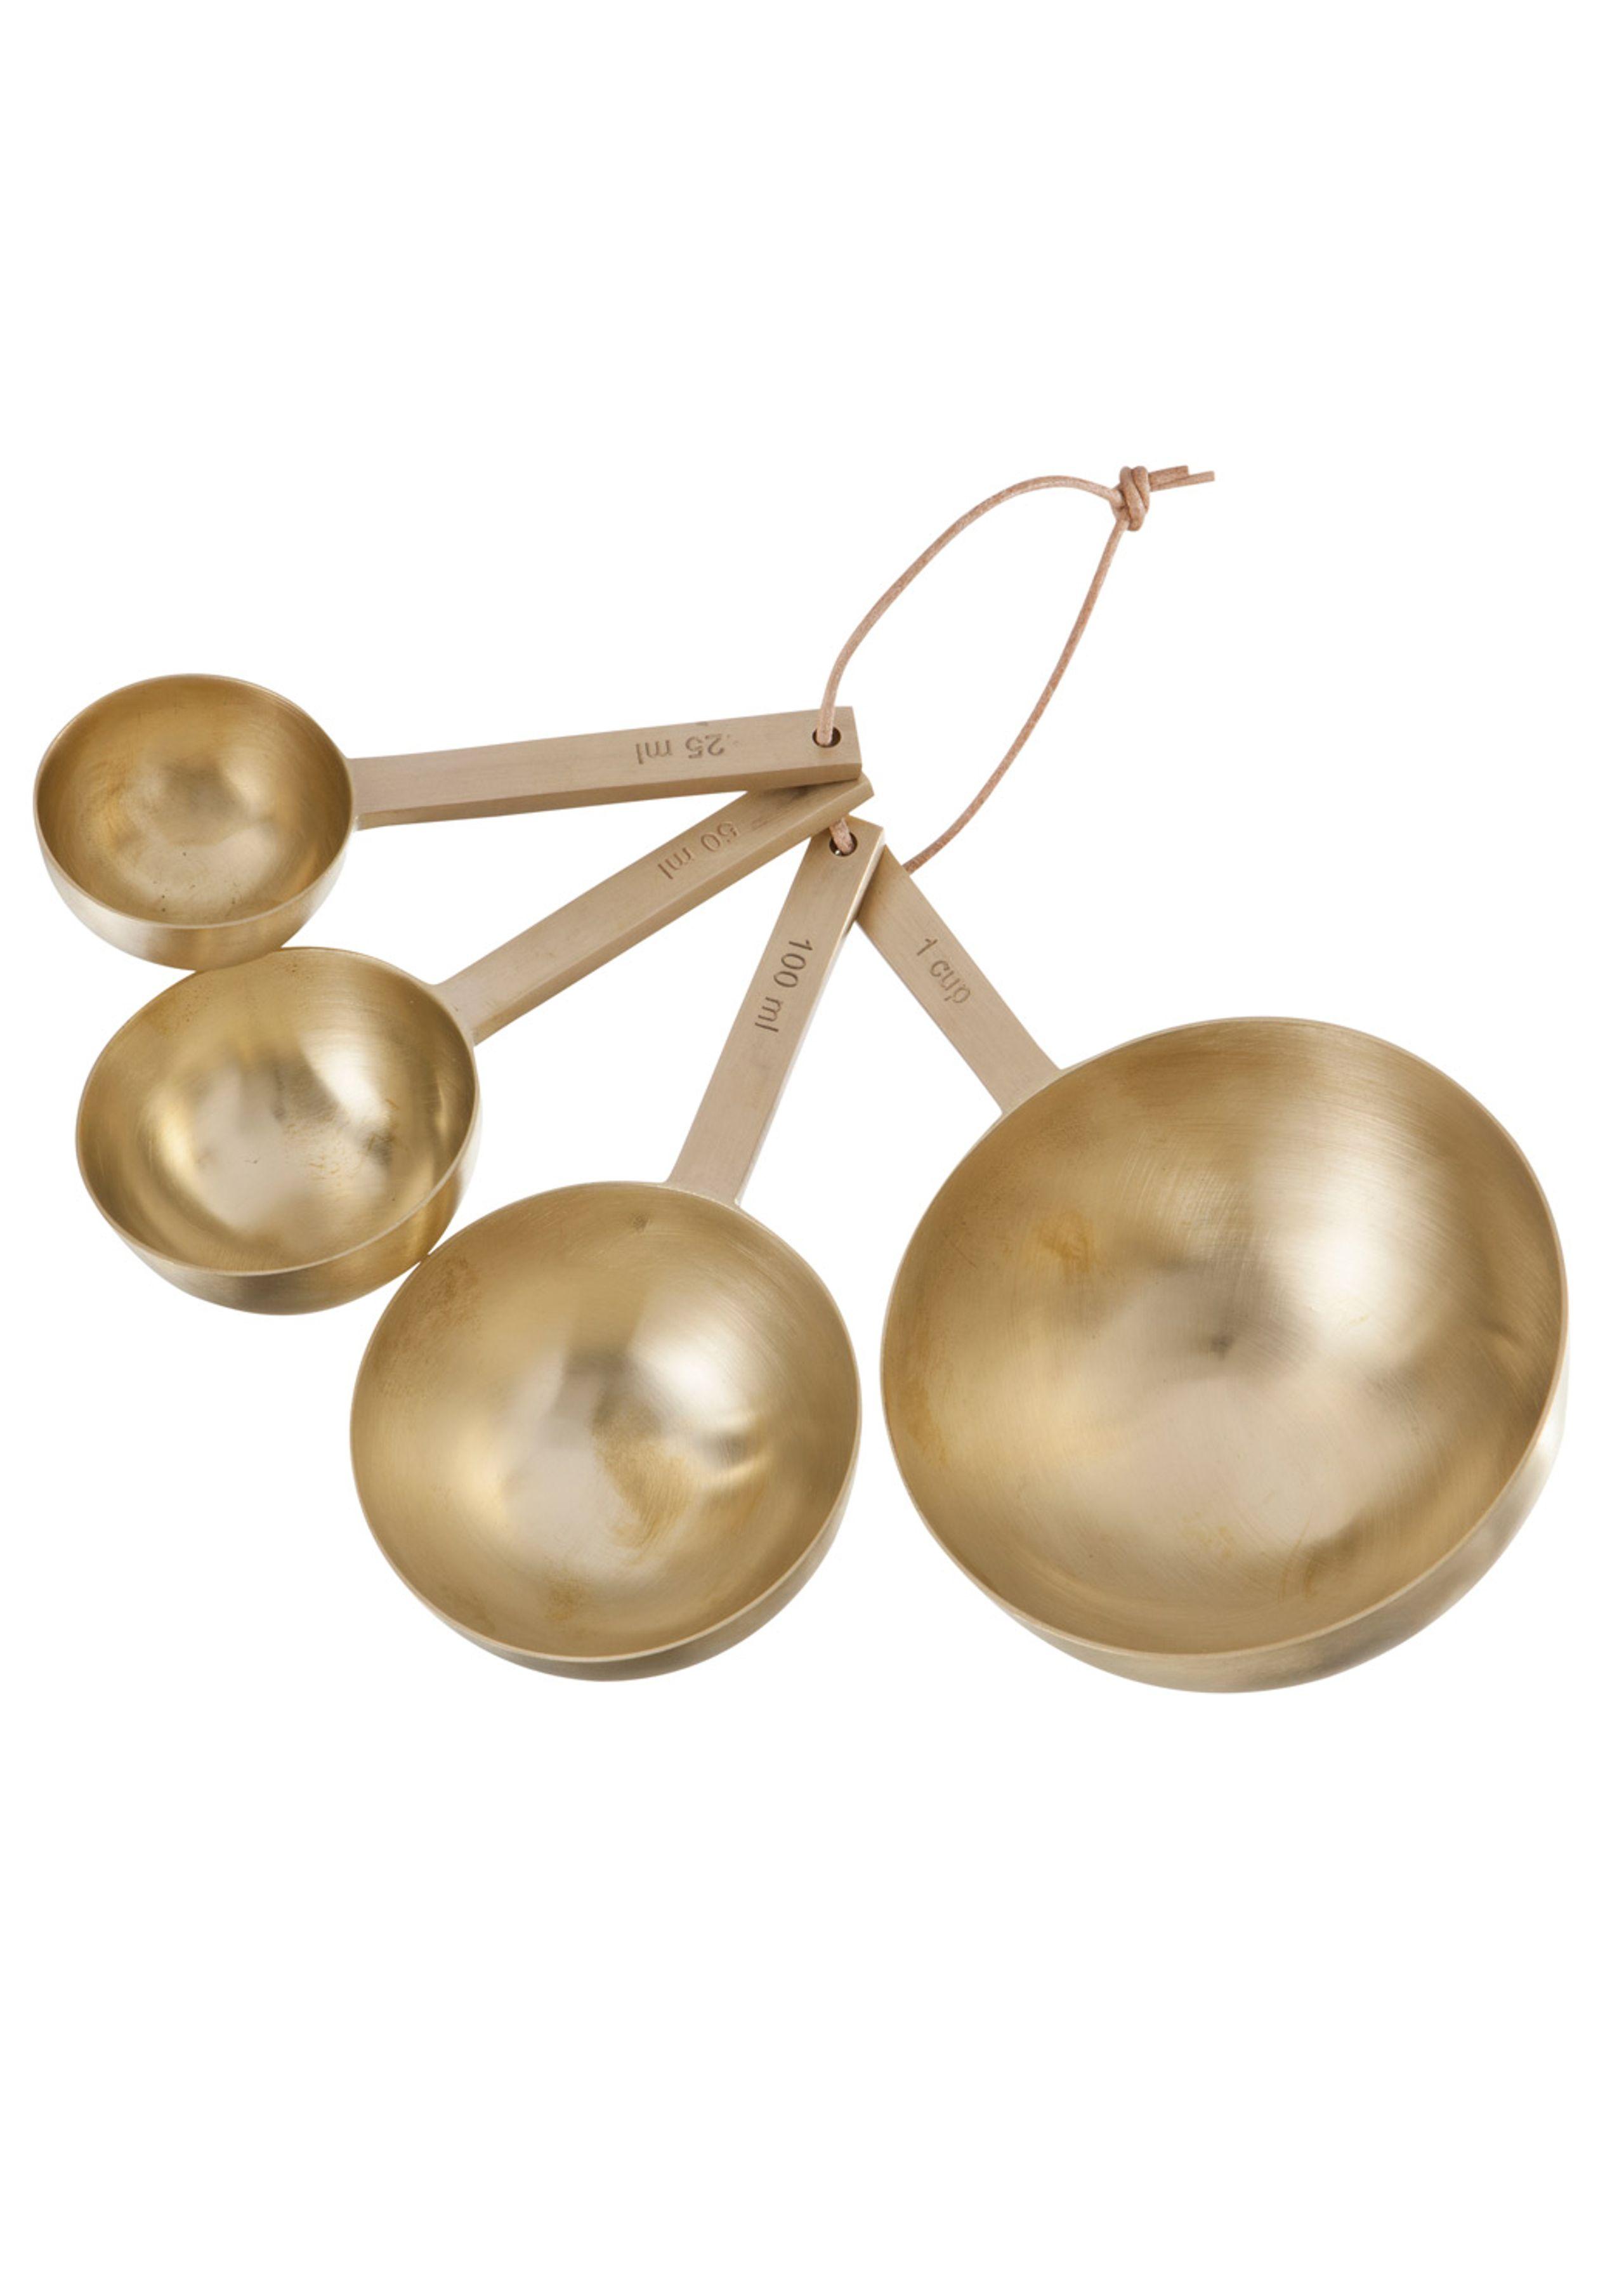 Brass measurement spoons